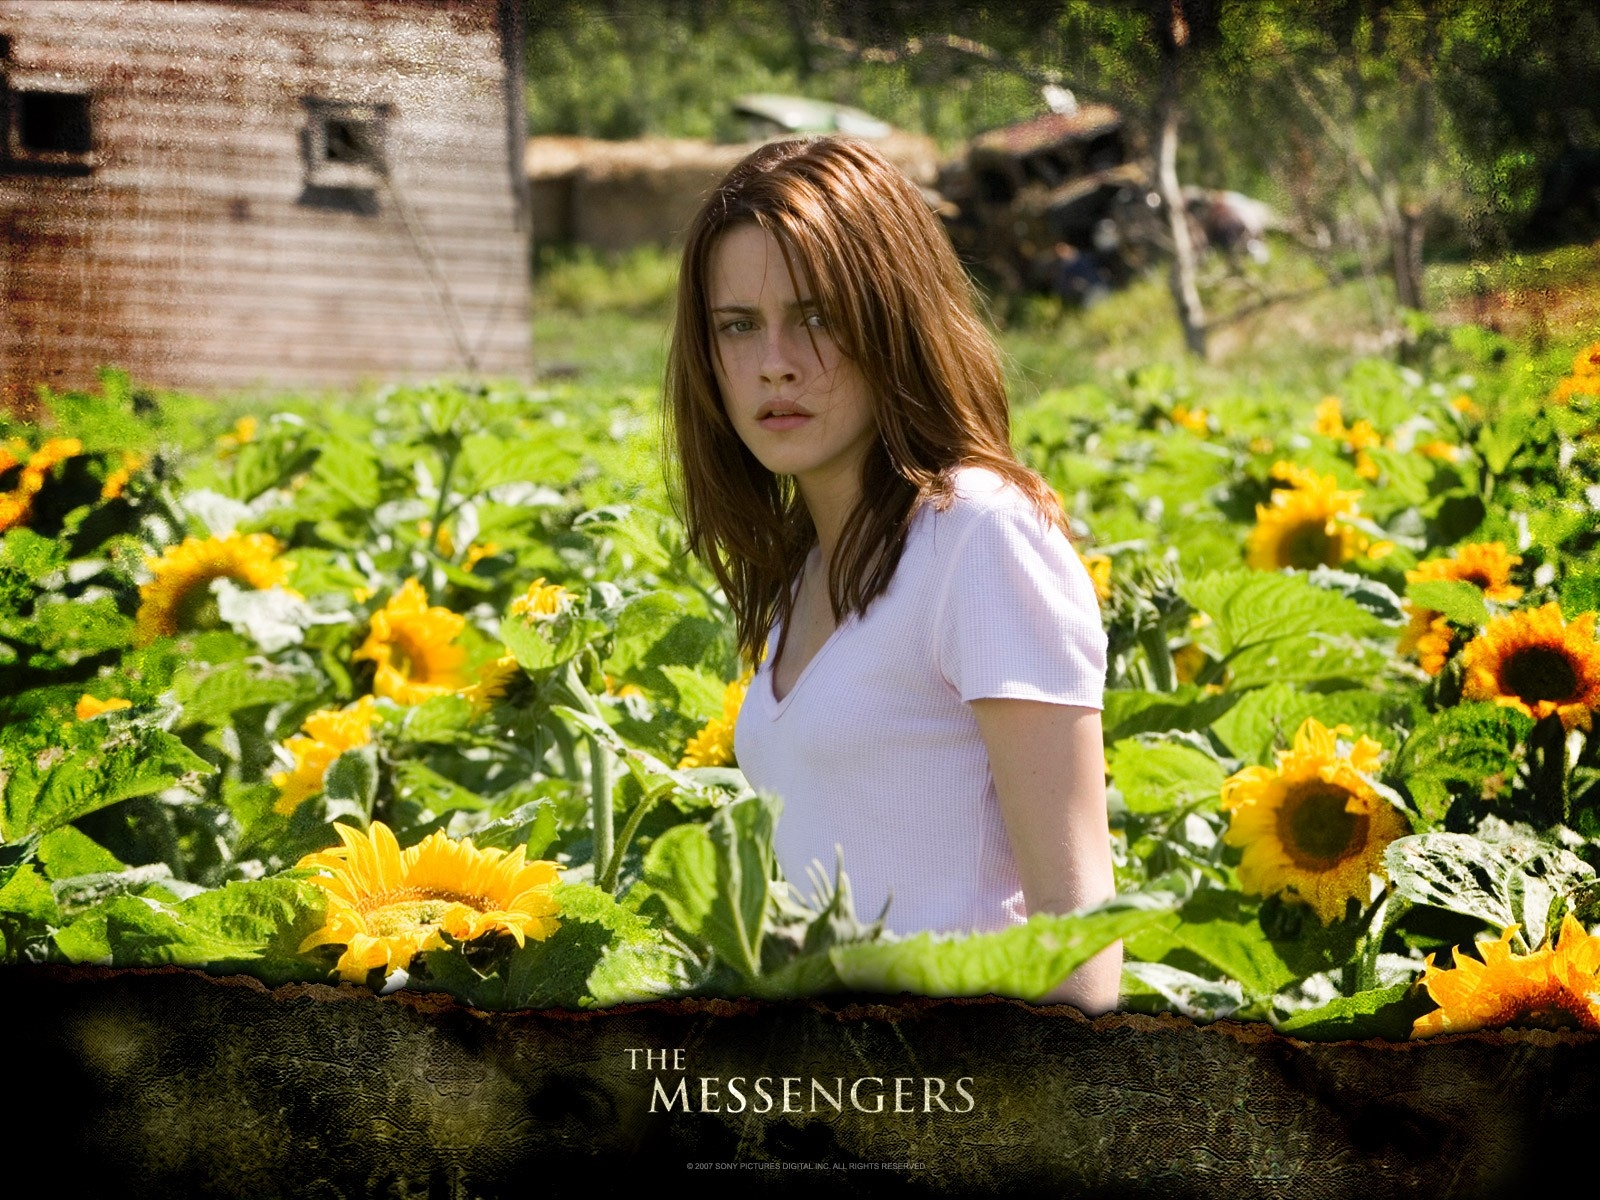 Wallpaper del film The Messengers con Kristen Stewart